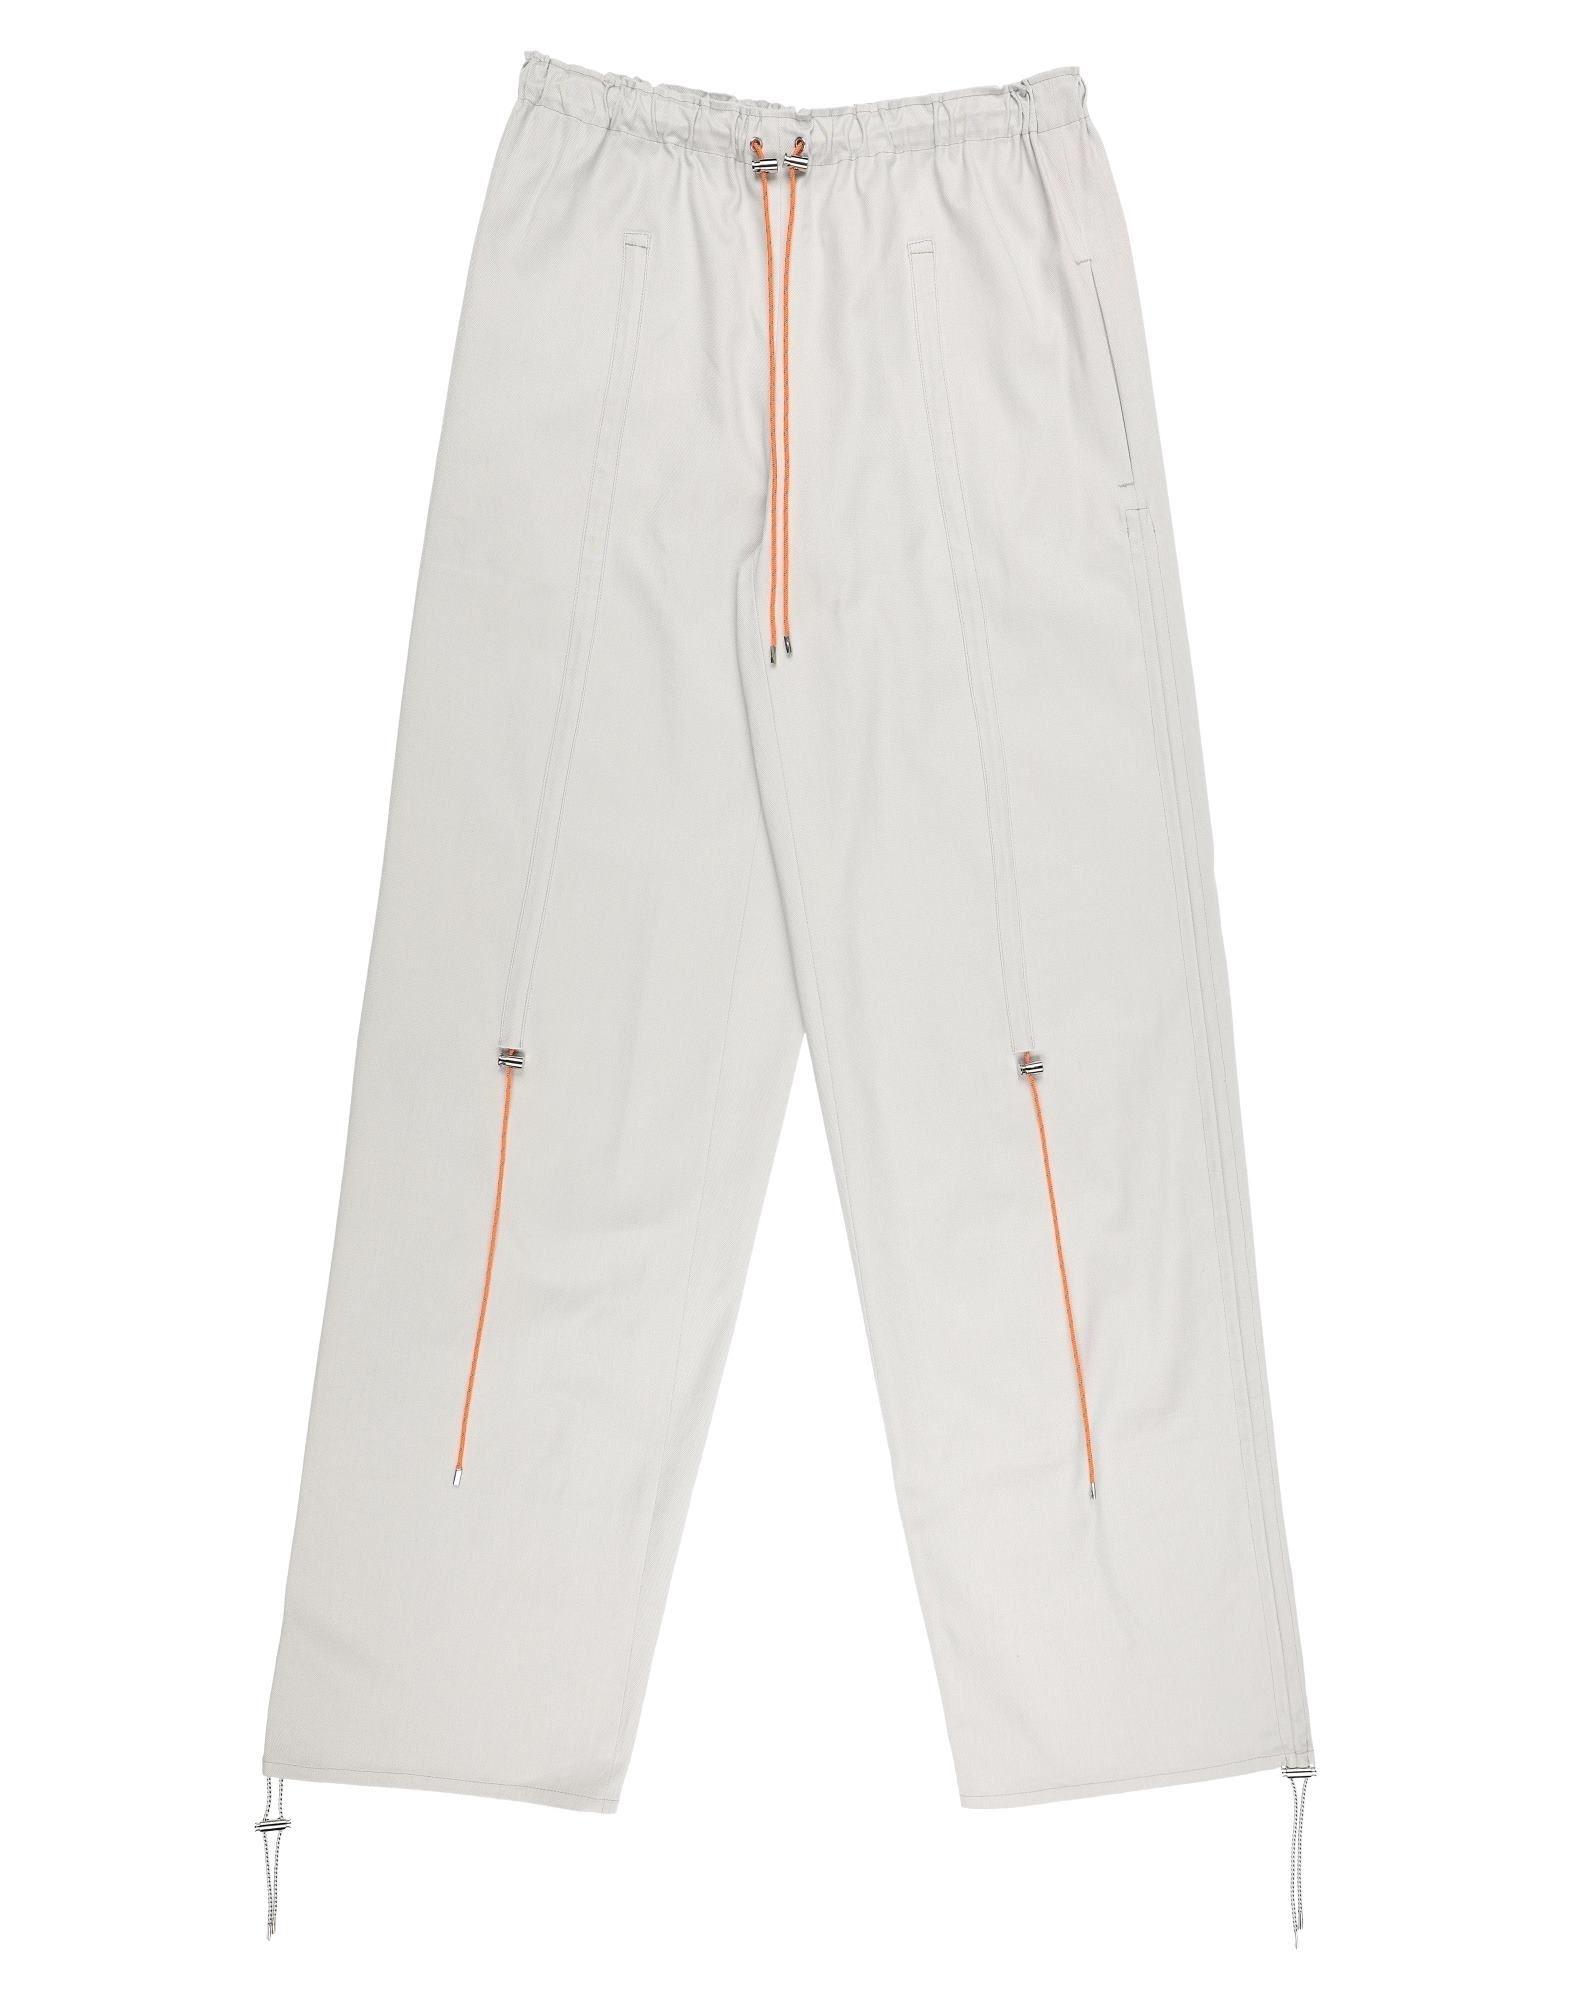 Afterhomework Casual Pants In Light Grey